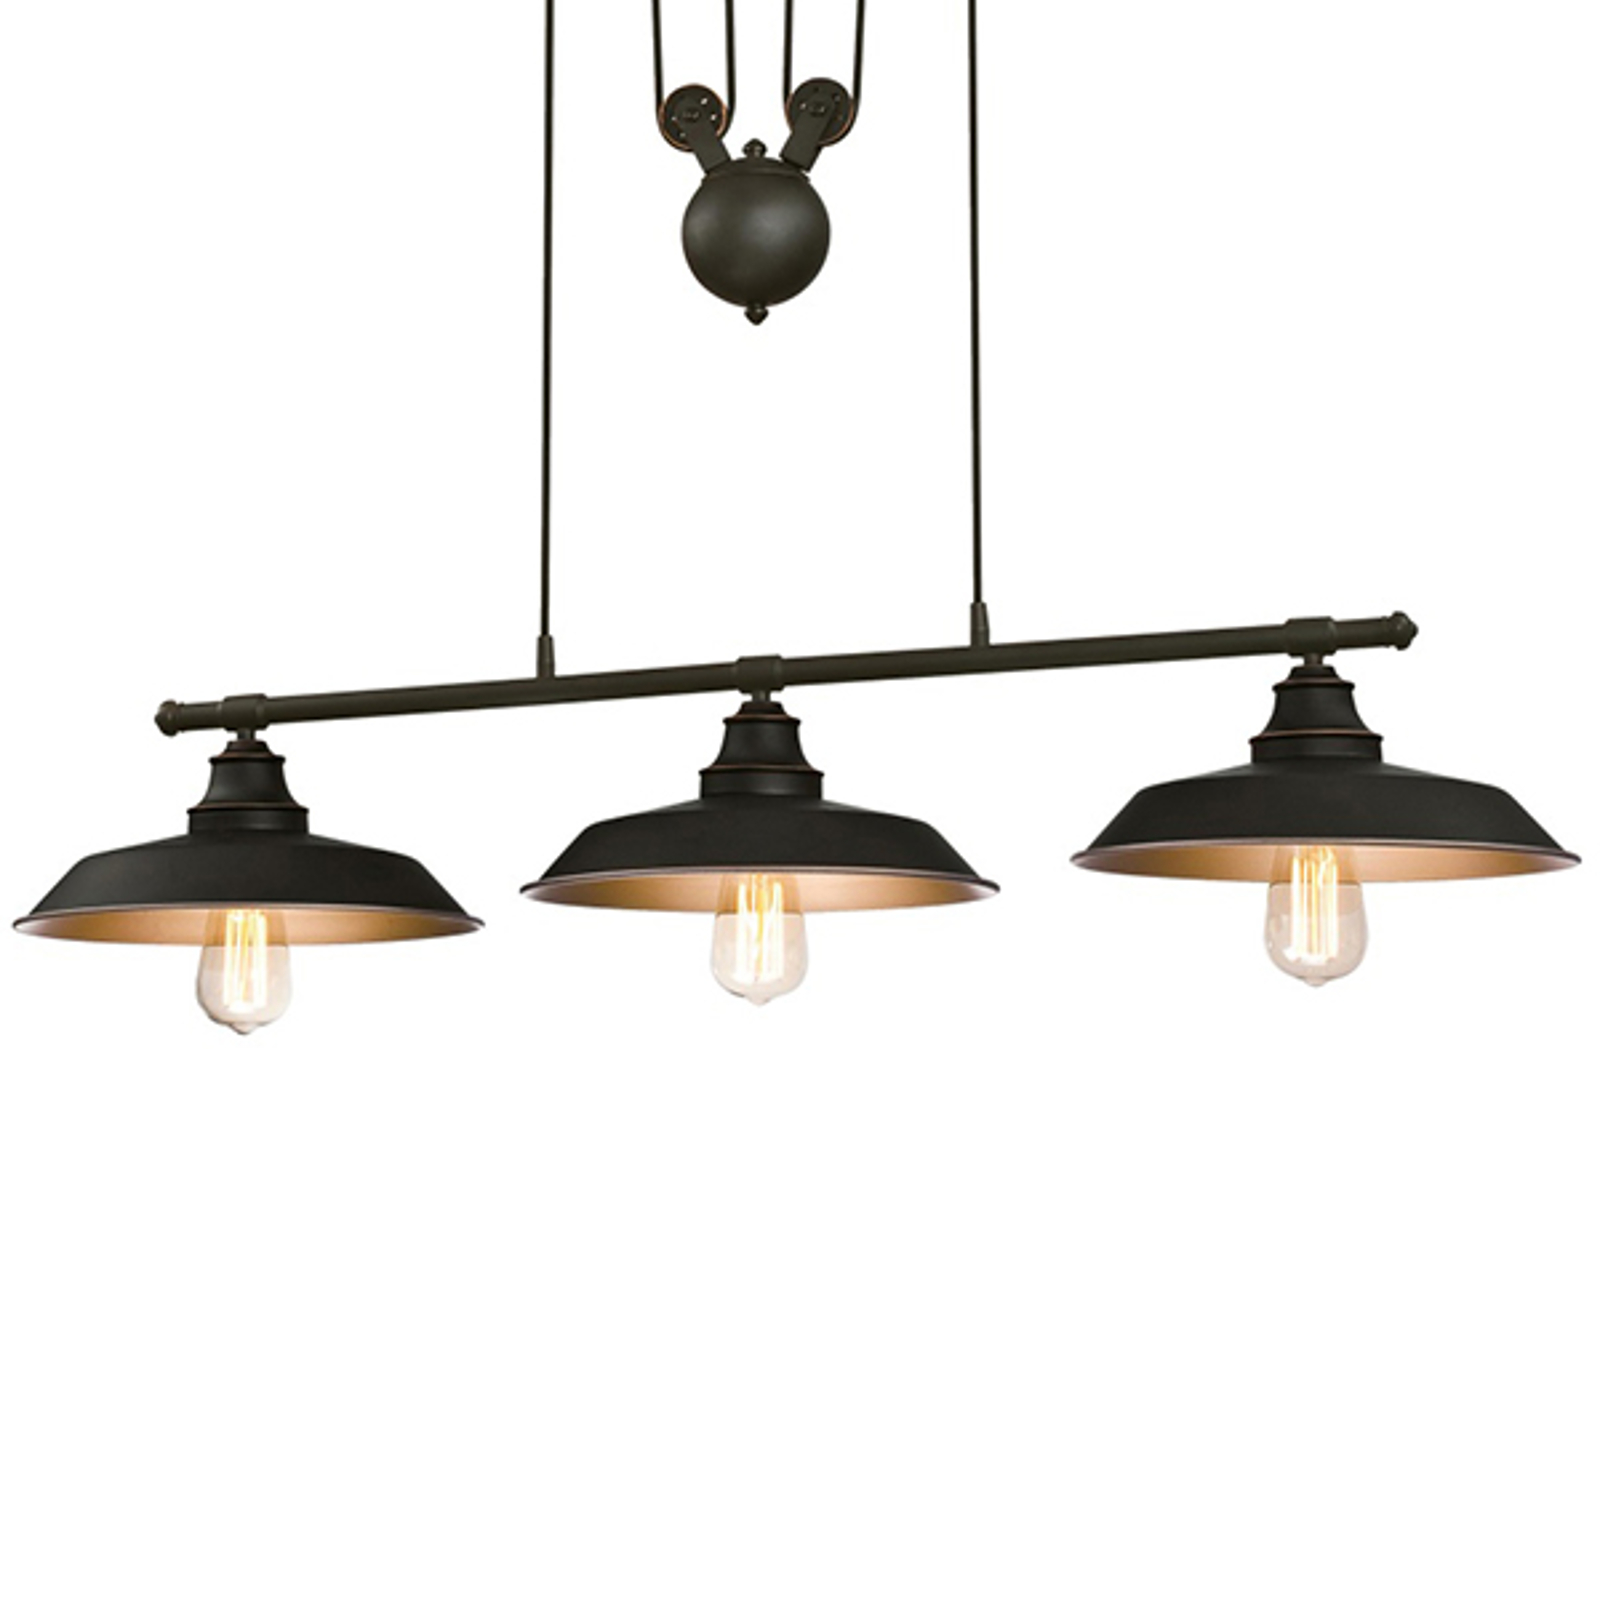 Westinghouse Iron Hill -riippuvalo, 3-lamp. musta